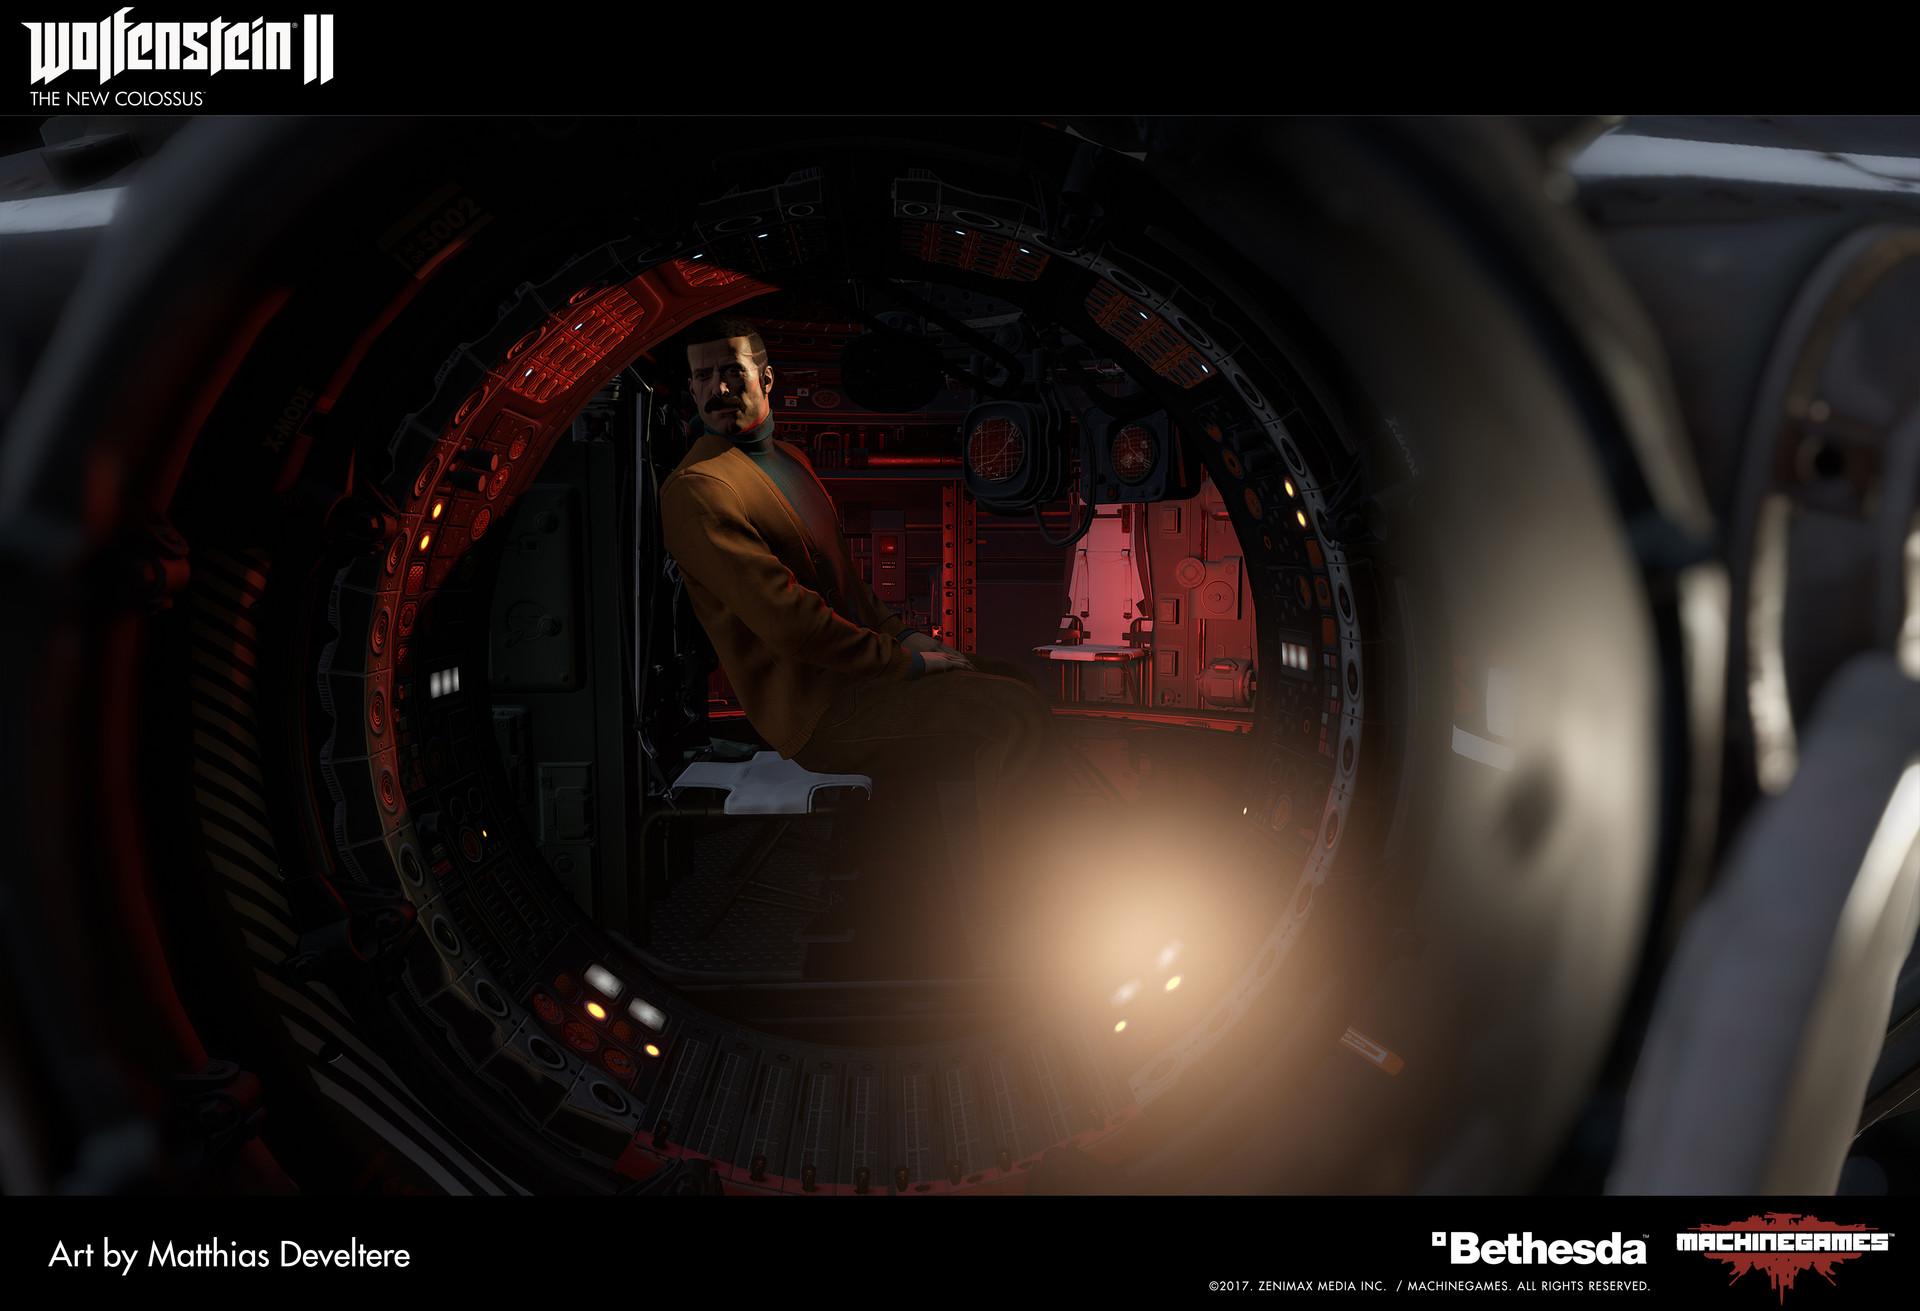 Matthias develtere ufo3